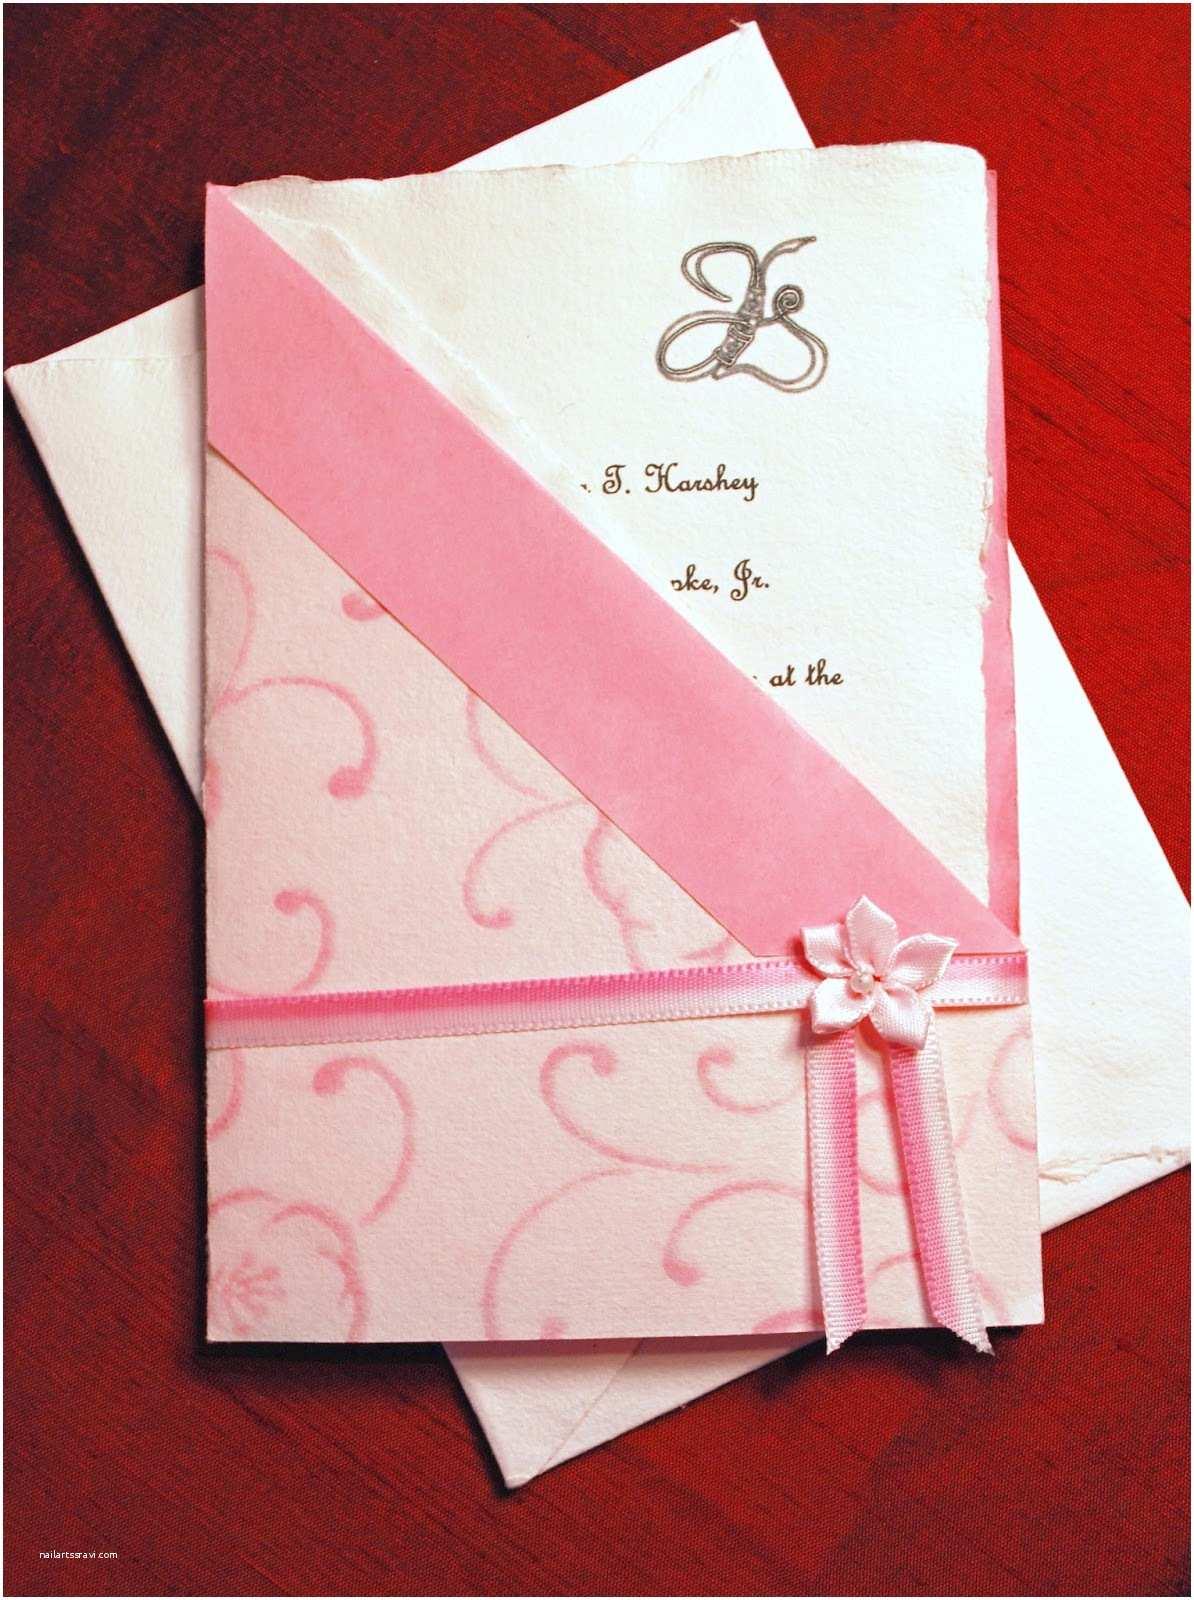 Wedding Invitation Envelopes Best Album Envelopes for Wedding Invitations